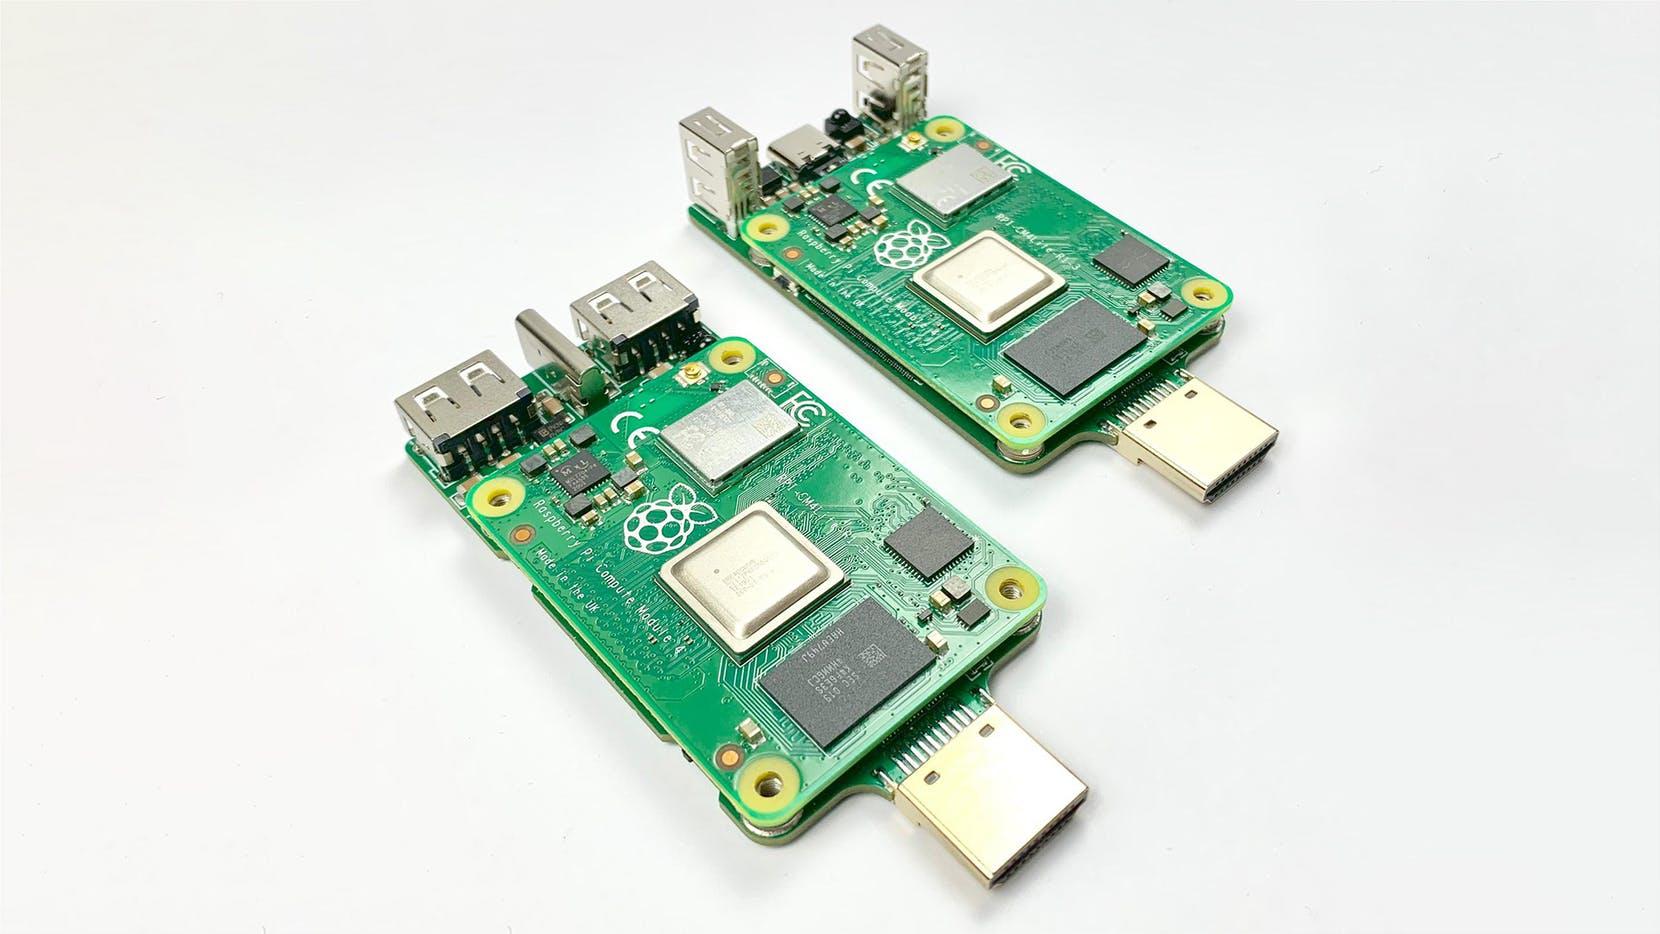 Meet the Raspberry Pi CM4 TV Stick that is better than the Raspberry Pi 4B